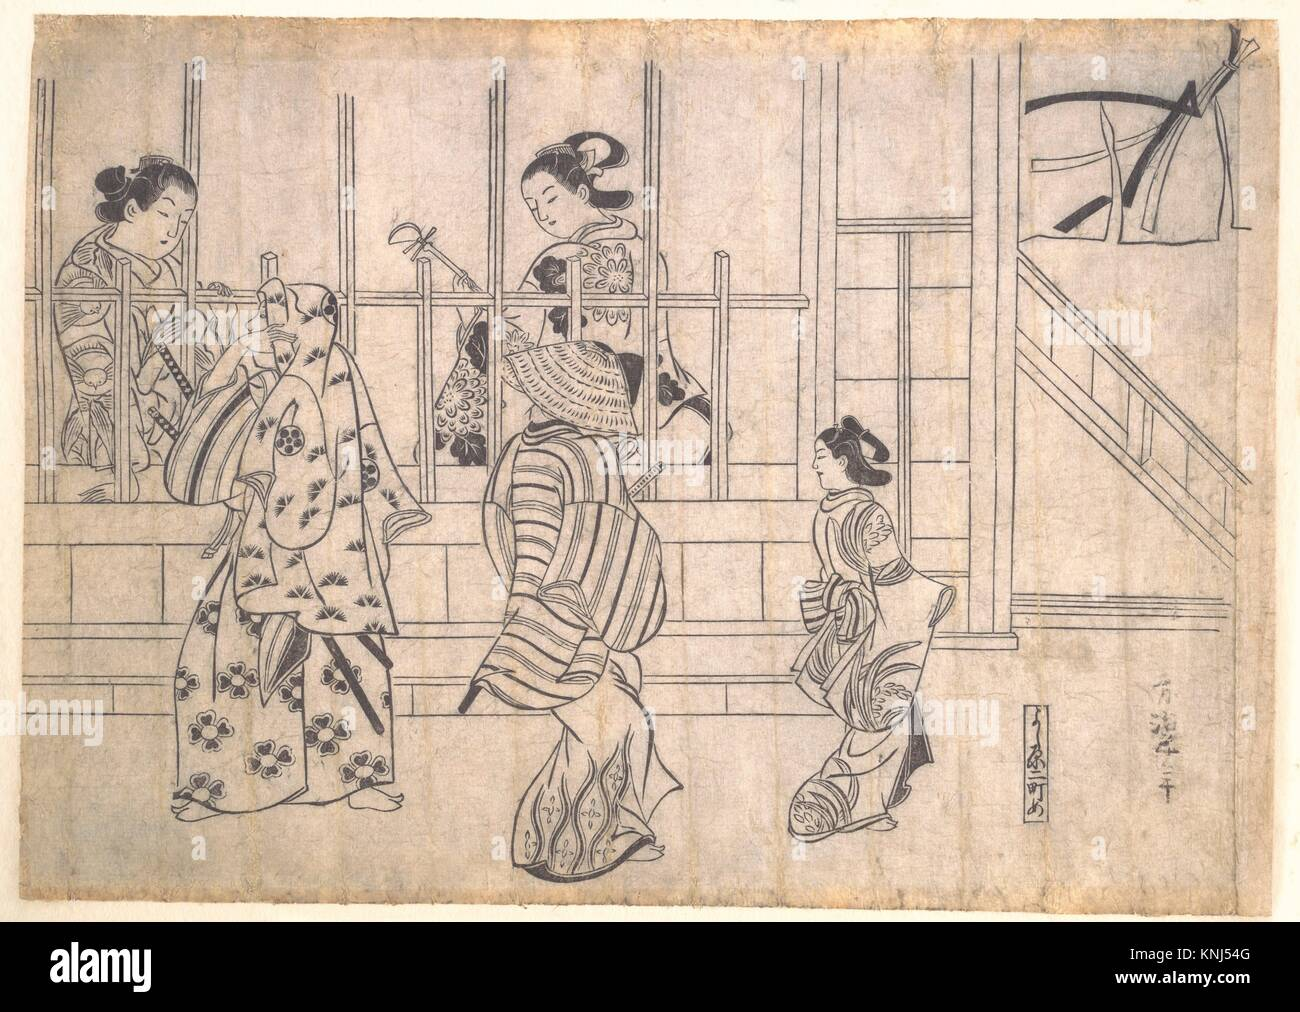 Street Scene in Yoshiwara. Artist: Hishikawa Moronobu (Japanese, died 1694); Period: Edo period (1615-1868); Date: - Stock Image